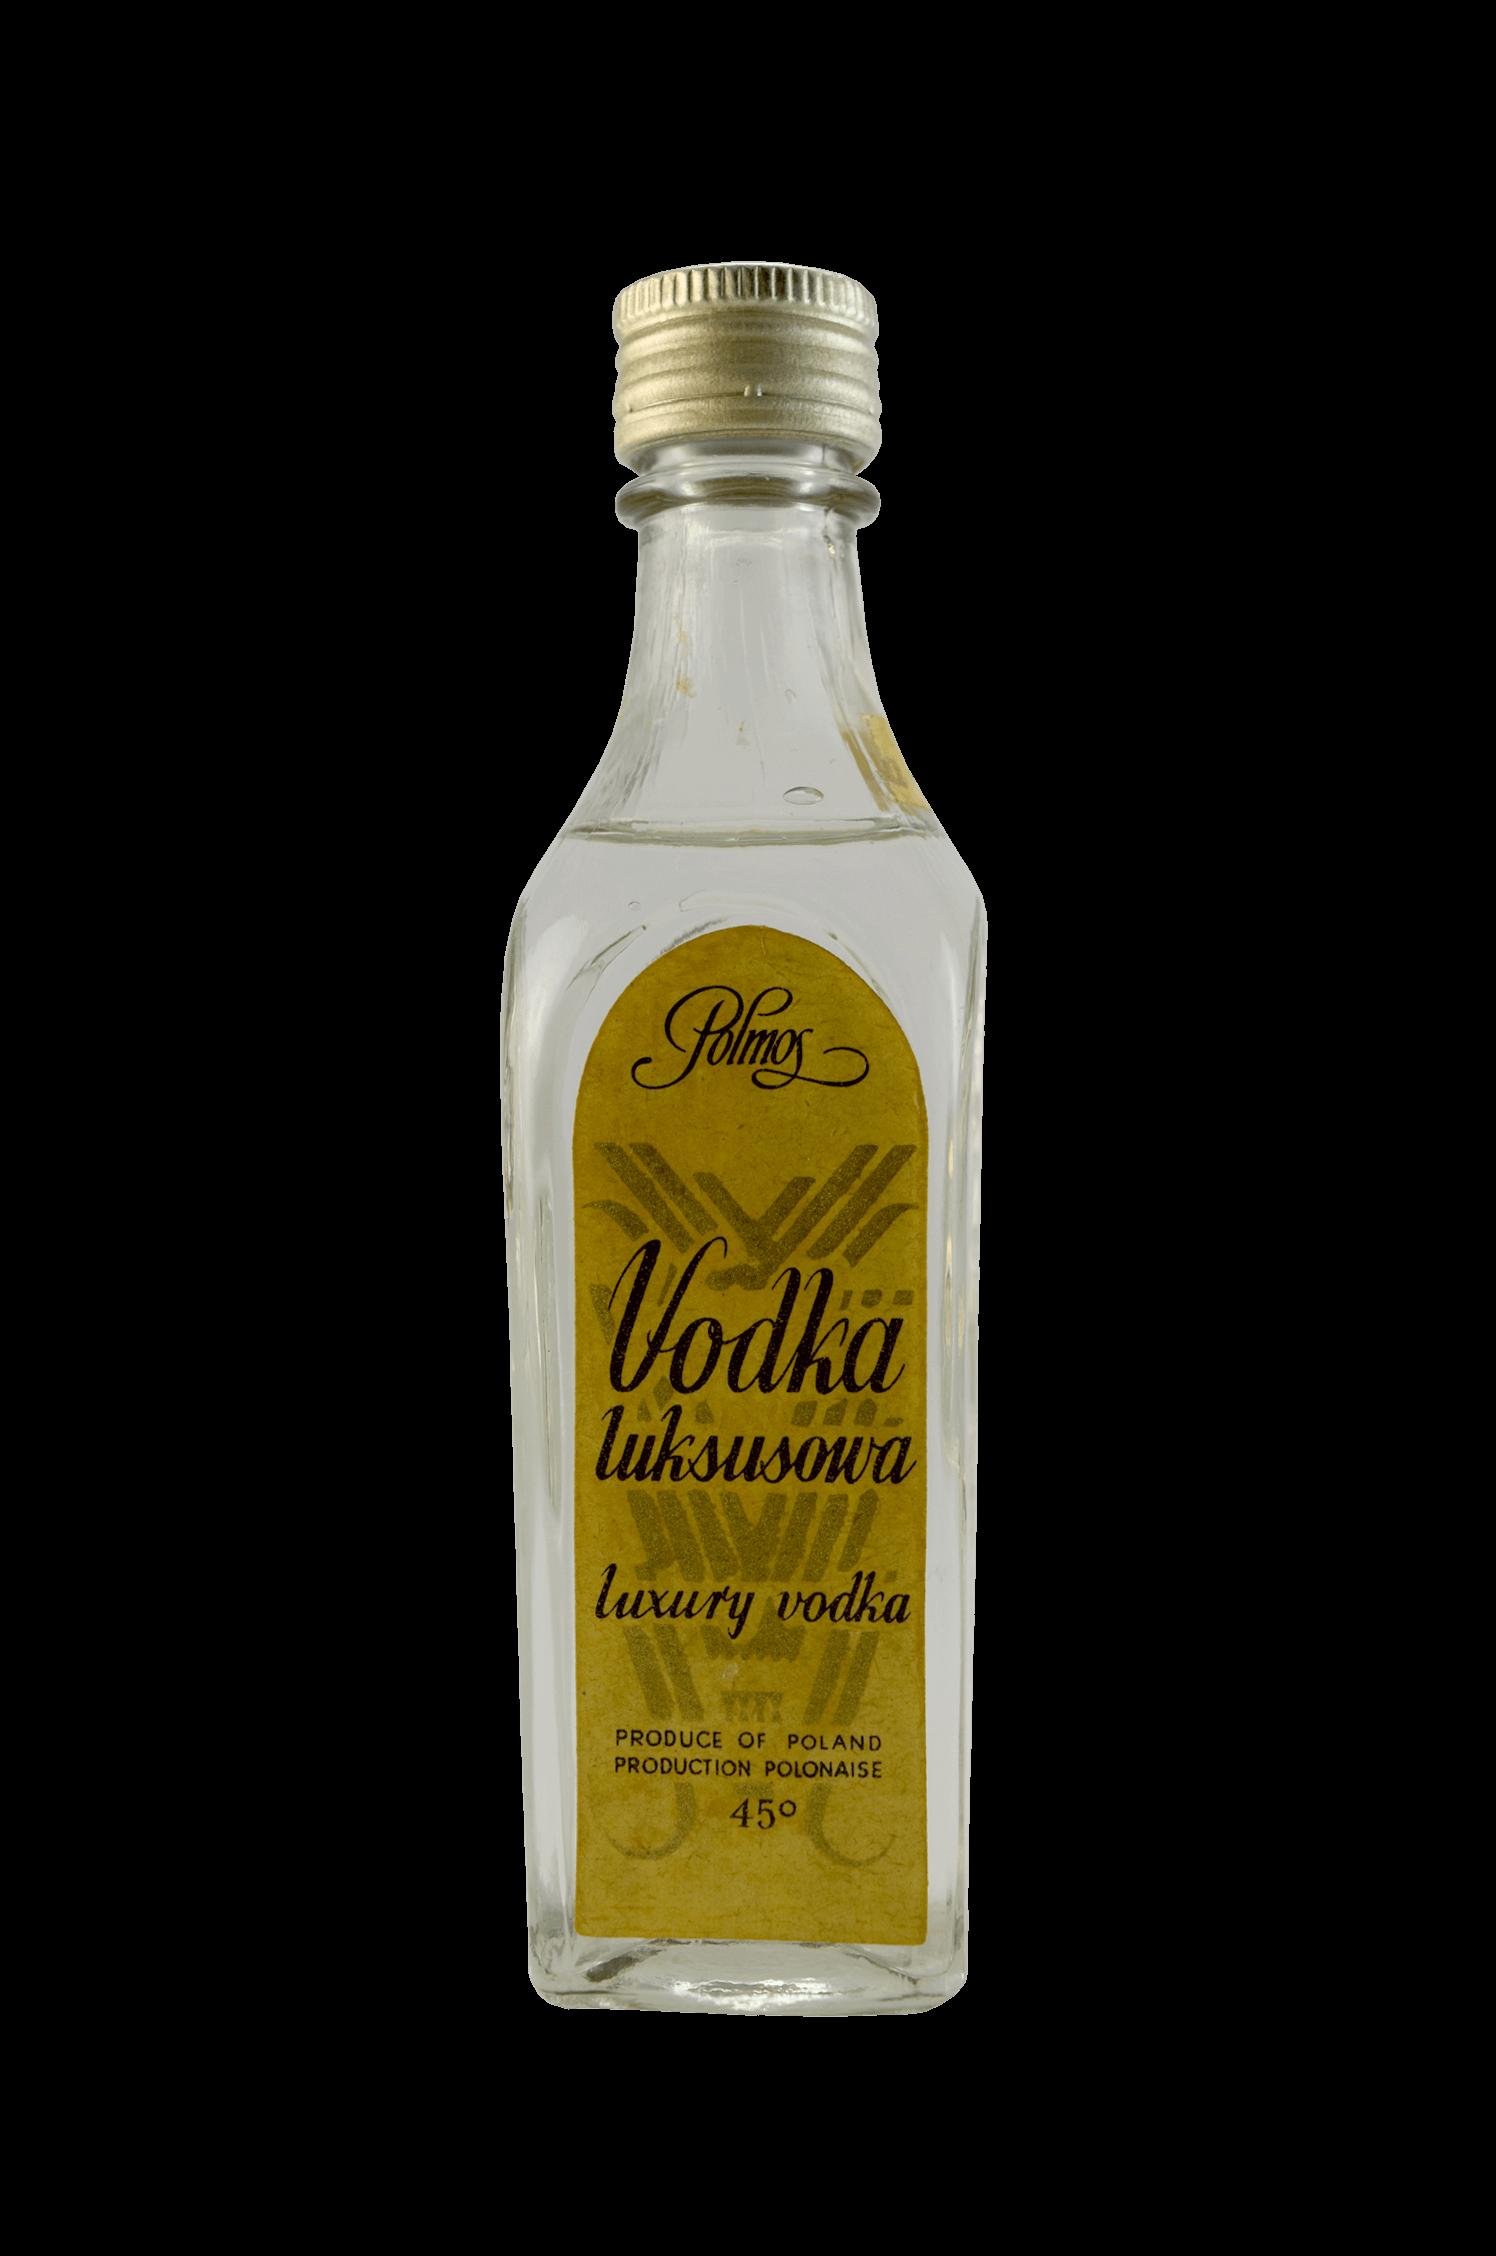 Vodka Luksusowa